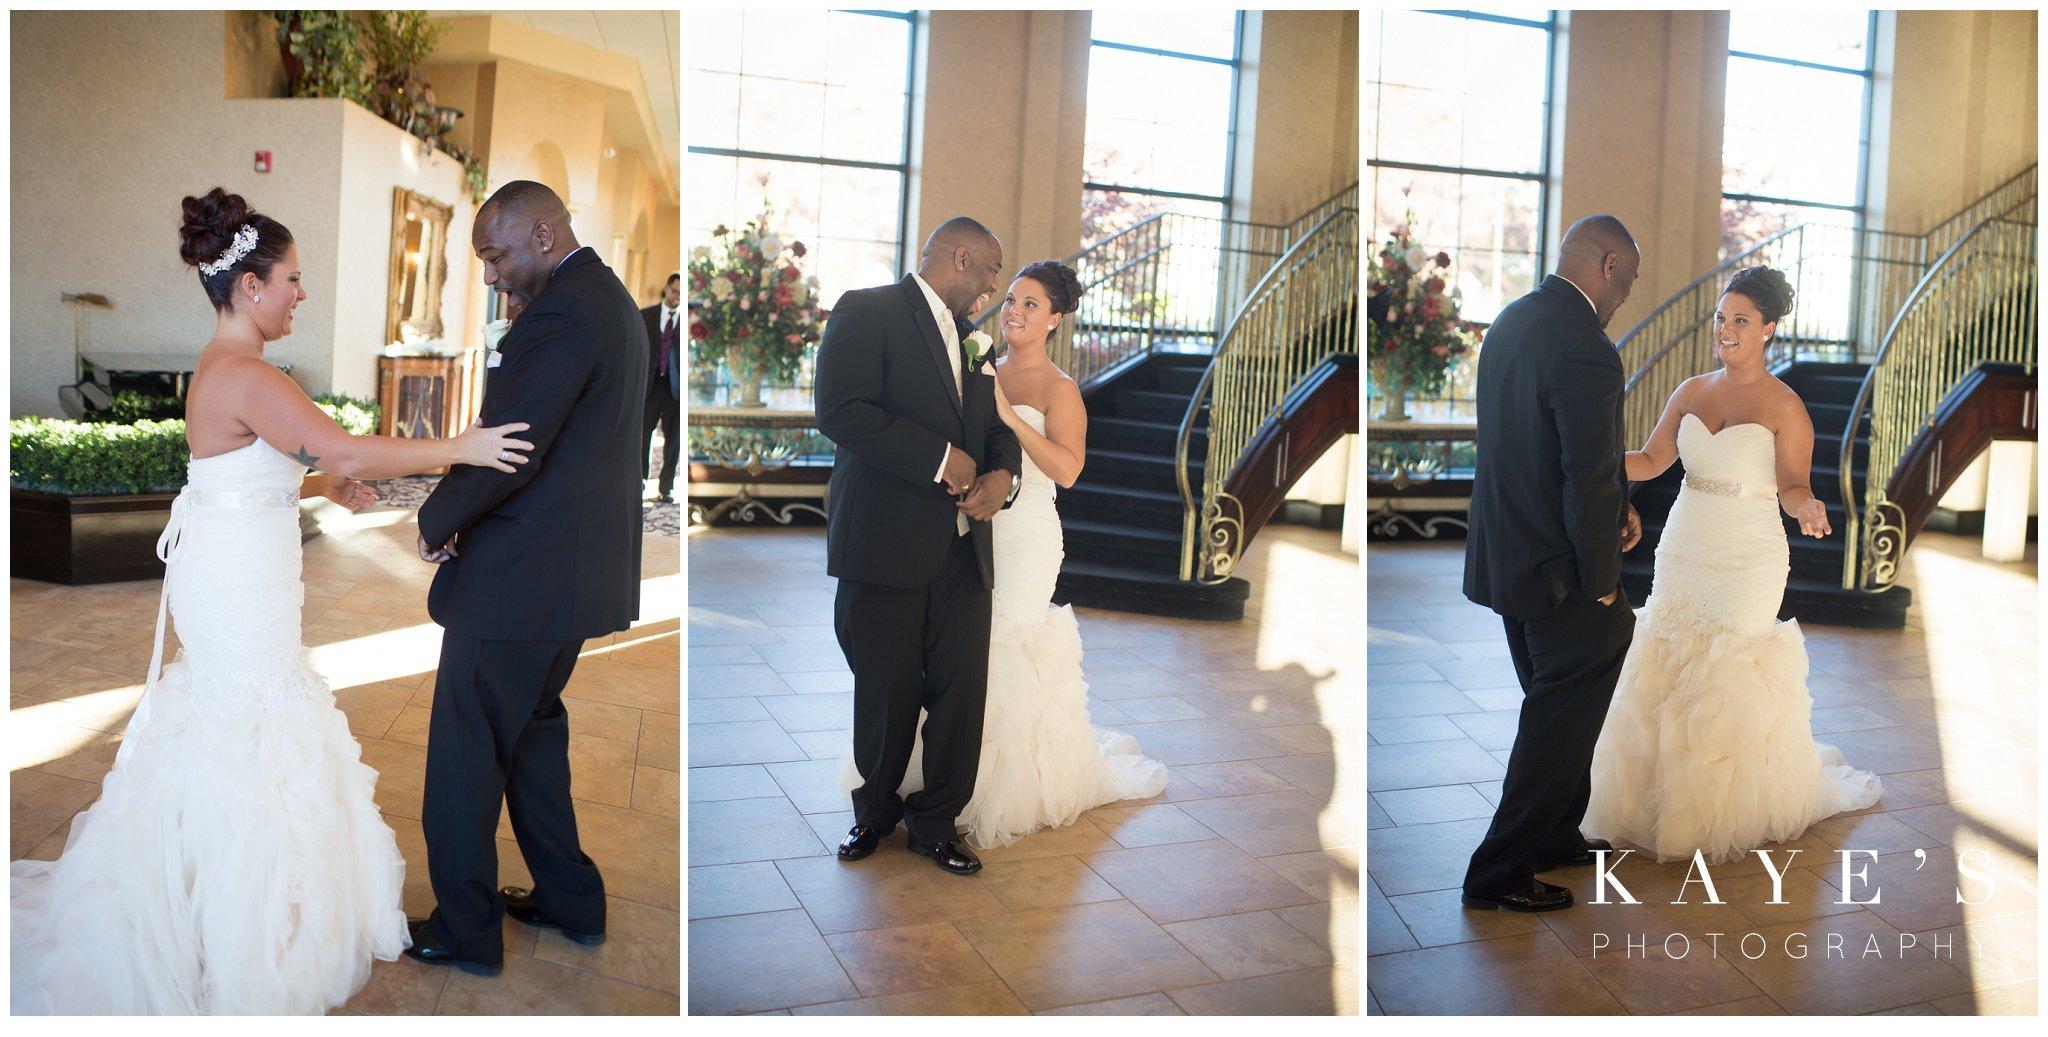 Kayes Photography- howell-michigan-wedding-photographer_0643.jpg